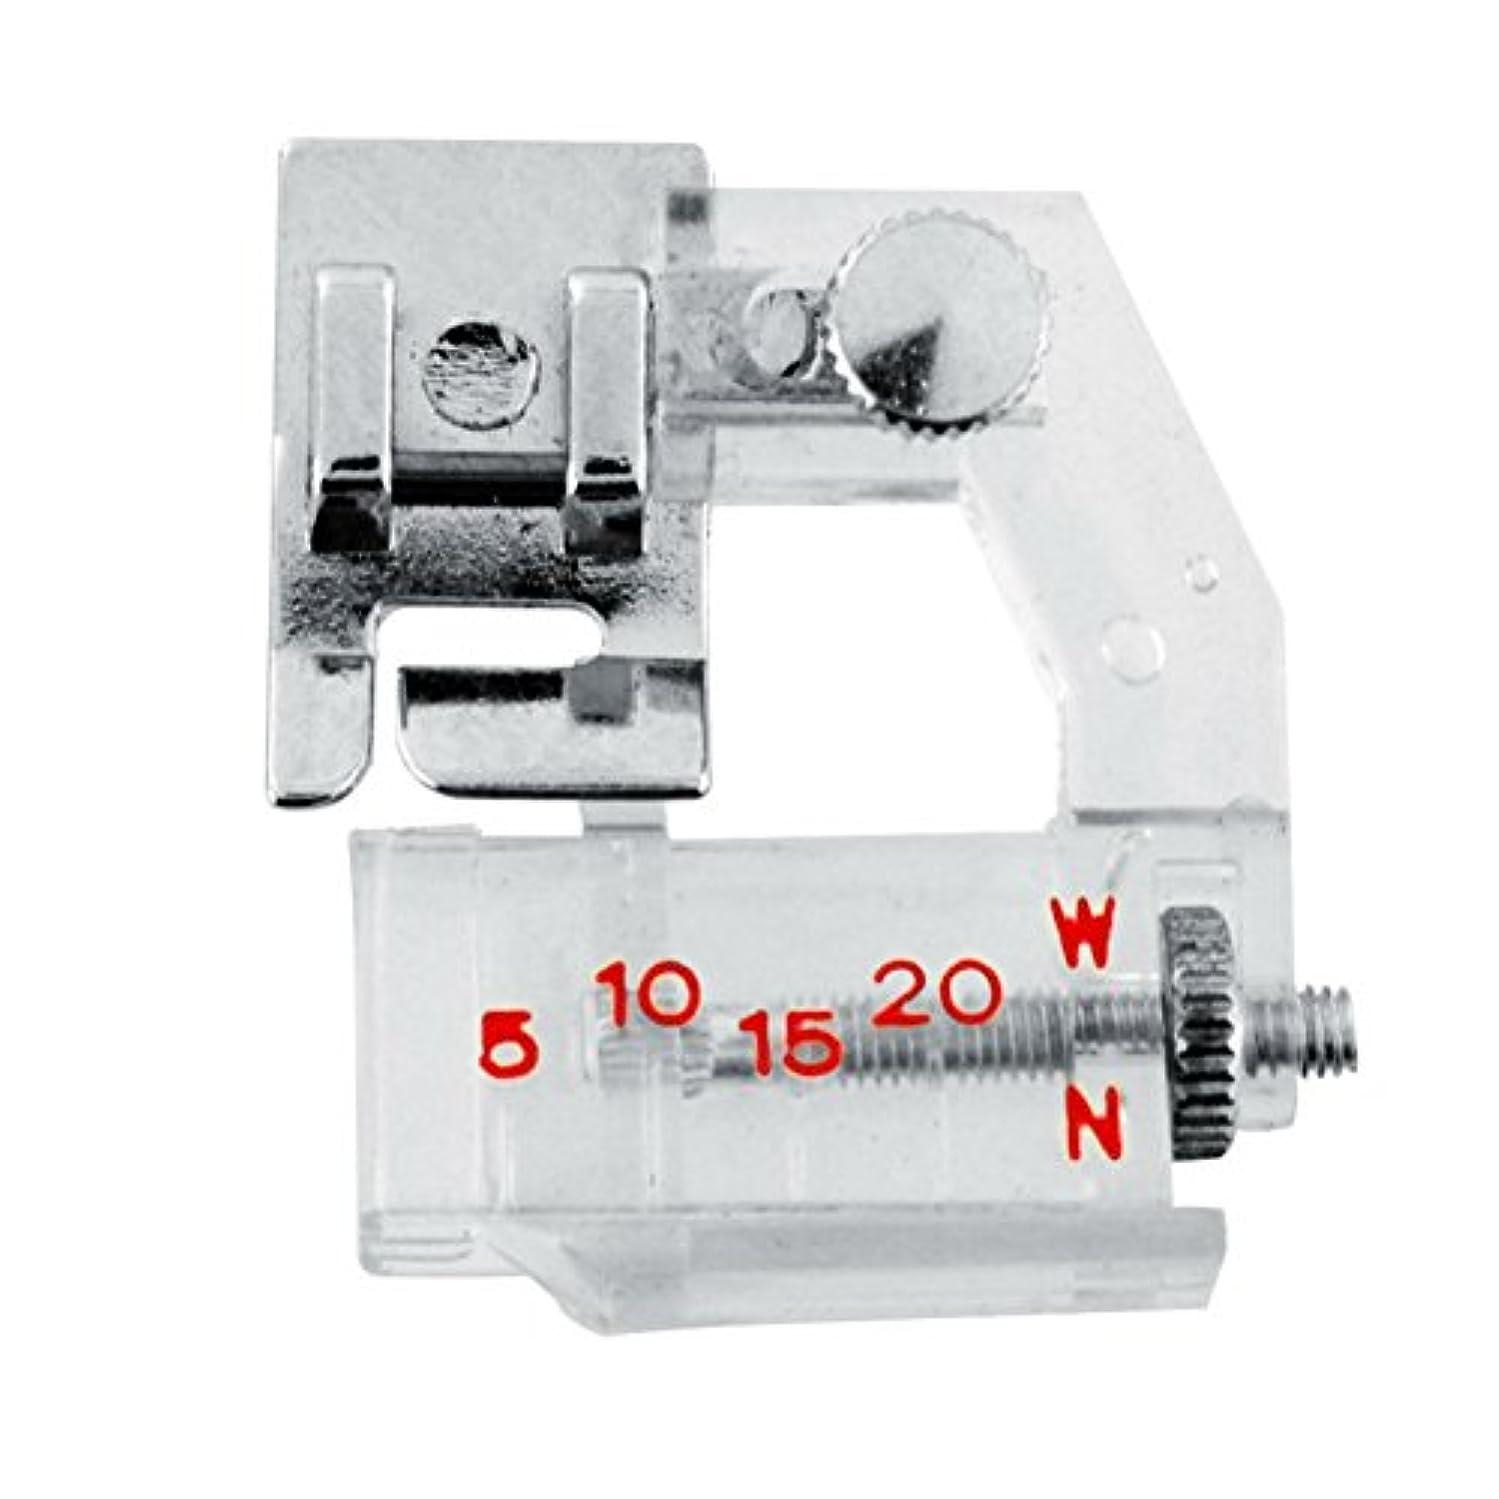 AKOAK Portable Adjustable Bias Binder Presser Foot Feet Kit for Sewing Machine Brother Singer Janome Juki Babylock Useful Home Supply bnfn682886062